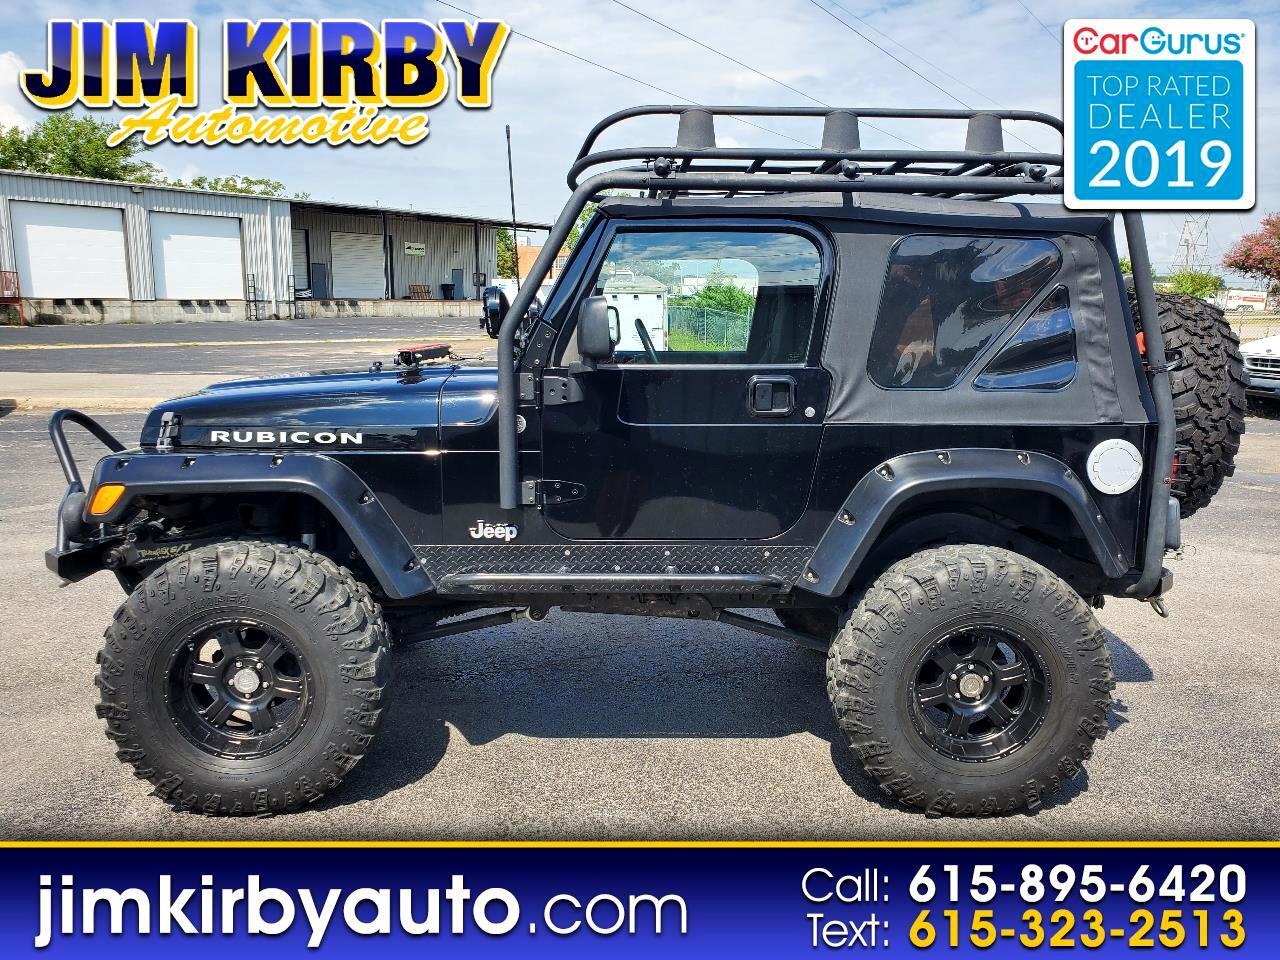 Used 2006 Jeep Wrangler 2dr Rubicon For Sale In Murfreesboro Tn 37130 Jim Kirby Automotive